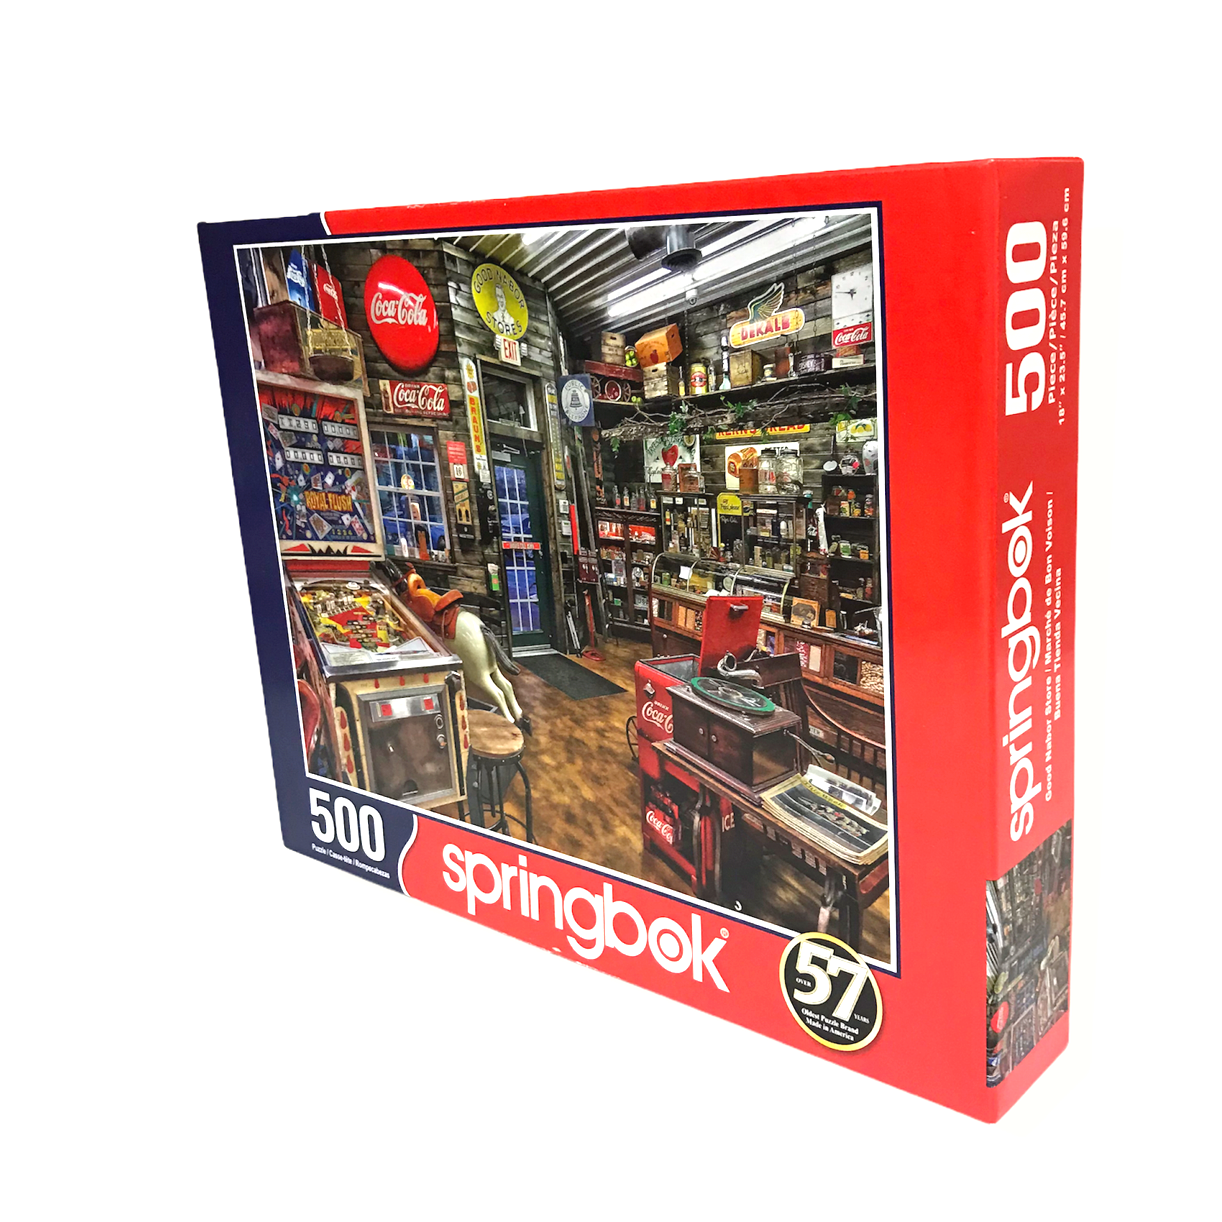 Good Nabor Store By Springbok 500 Piece Jigsaw Puzzle Vintage Coca Cola Items - $12.84